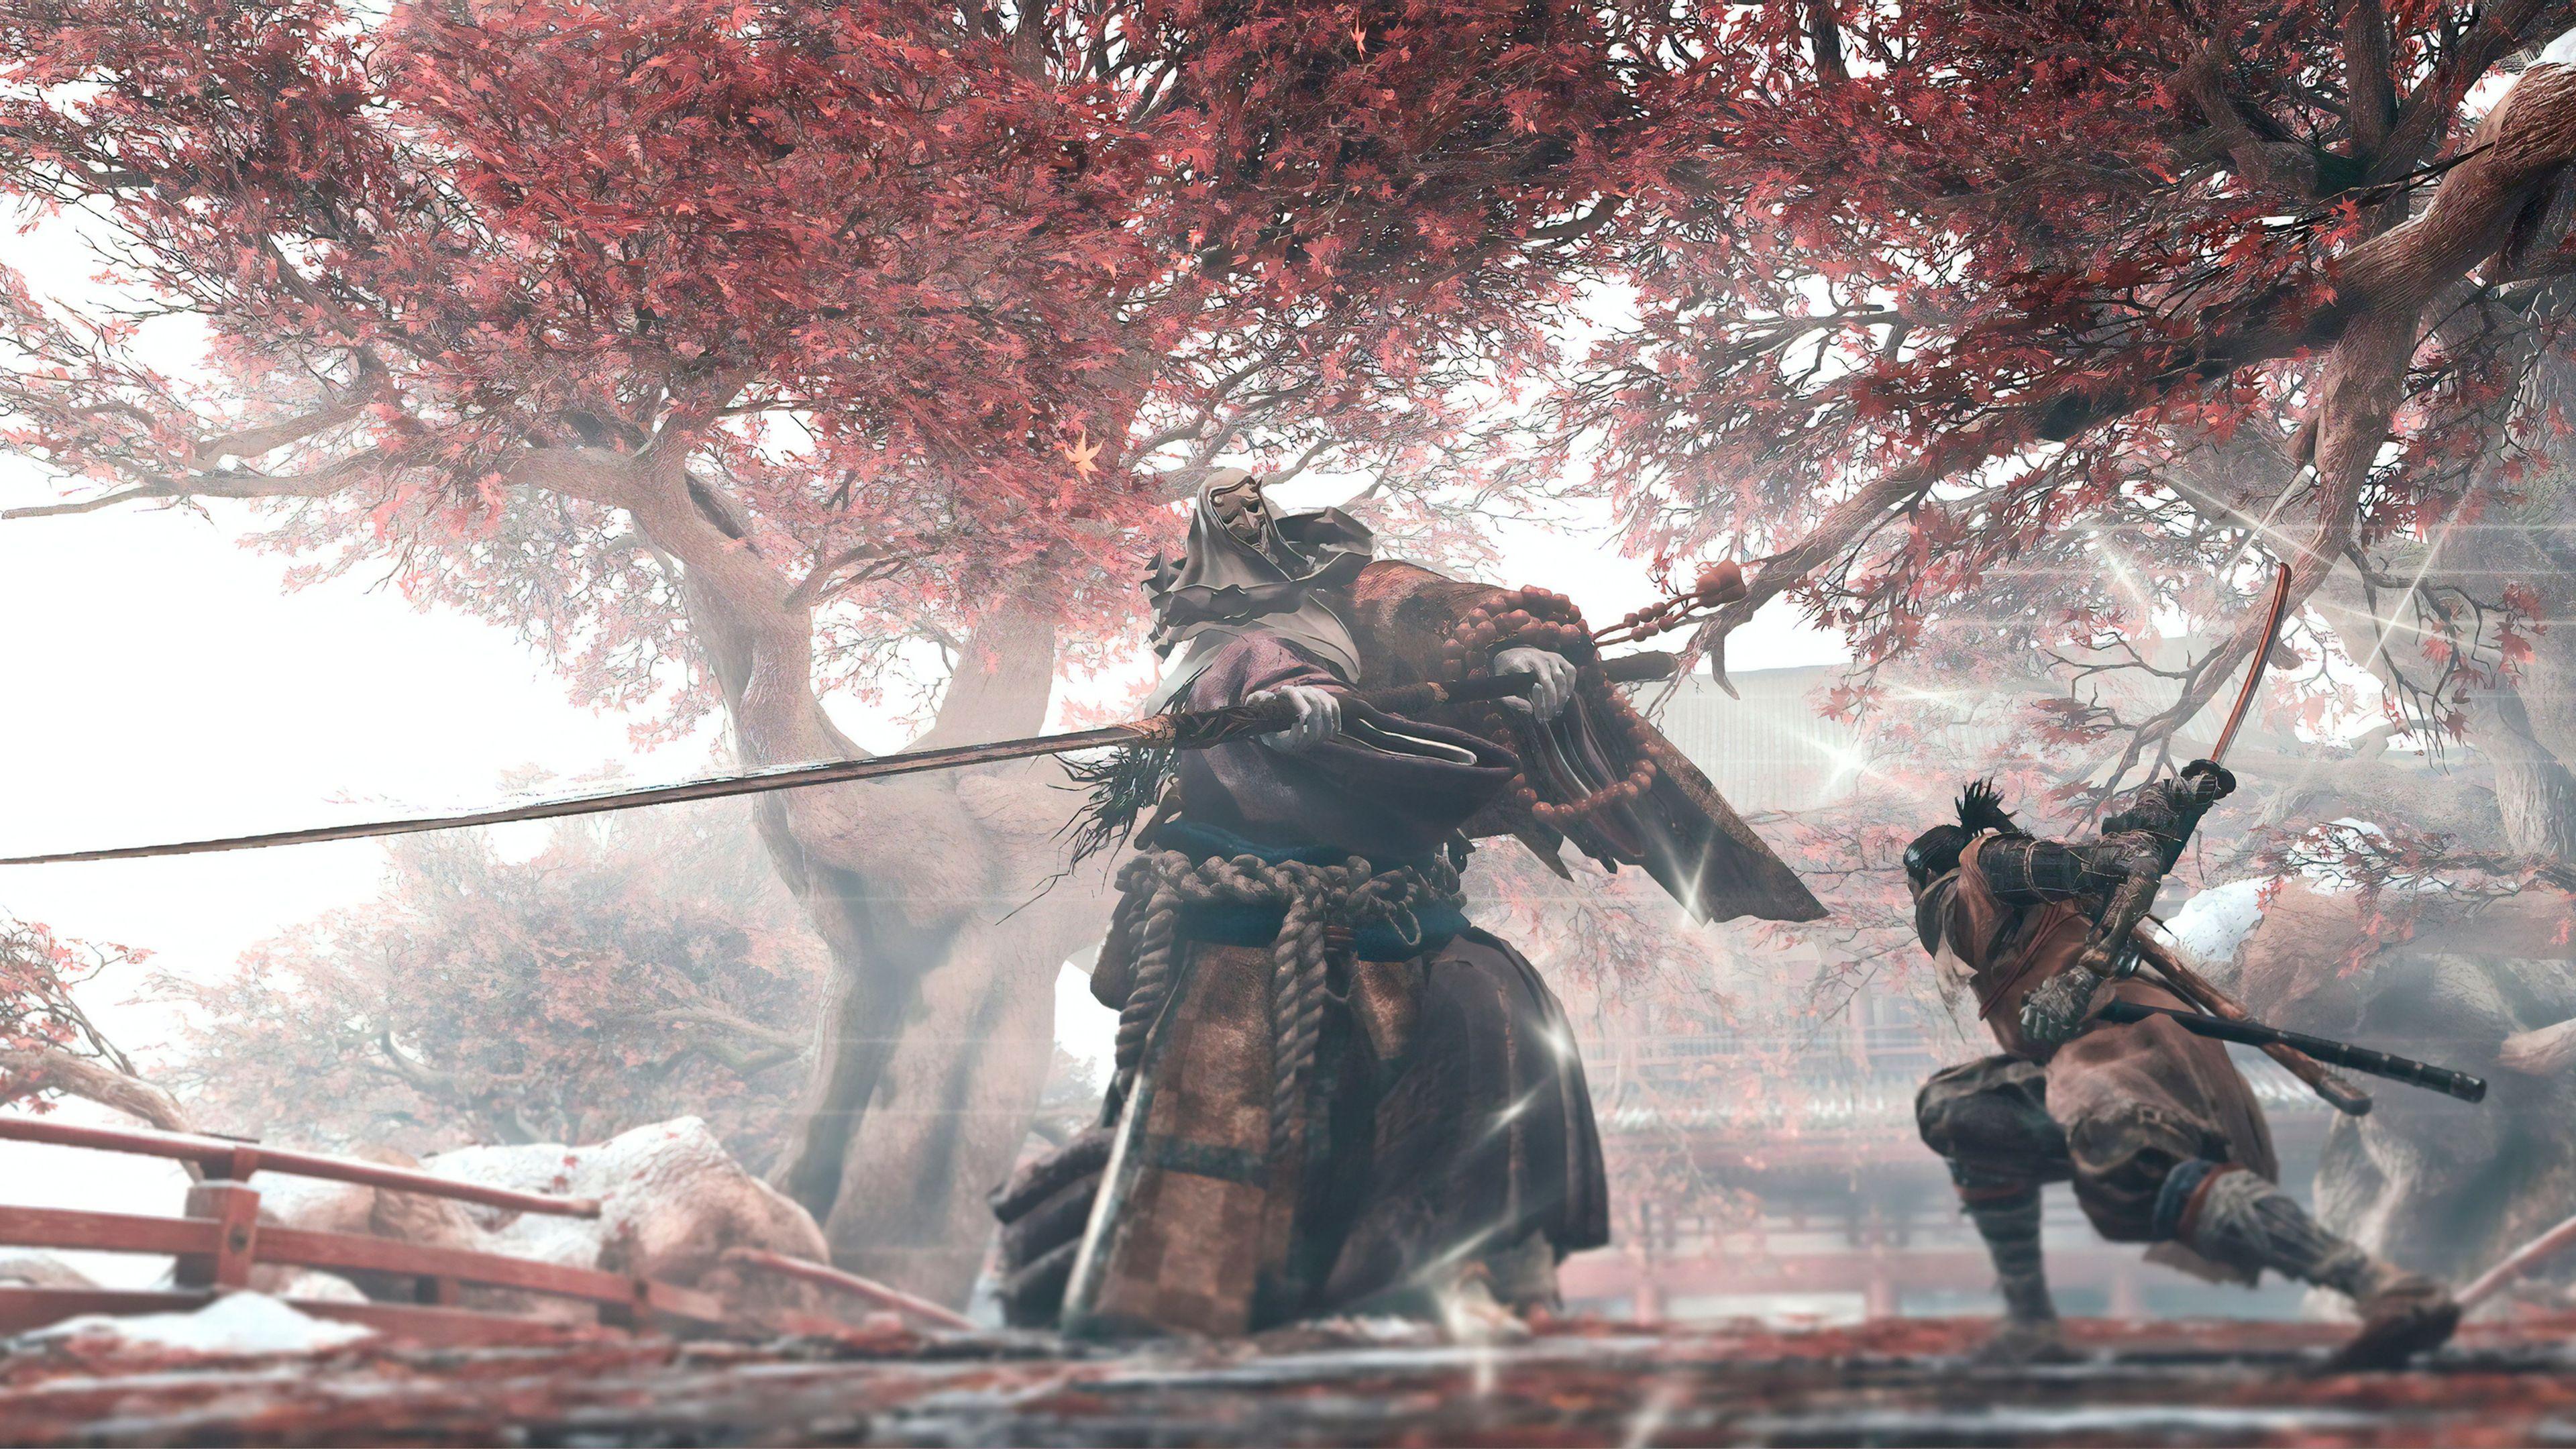 Wallpaper 4k Sekiro Shadows Die Twice Video Game 4k 2019 Games